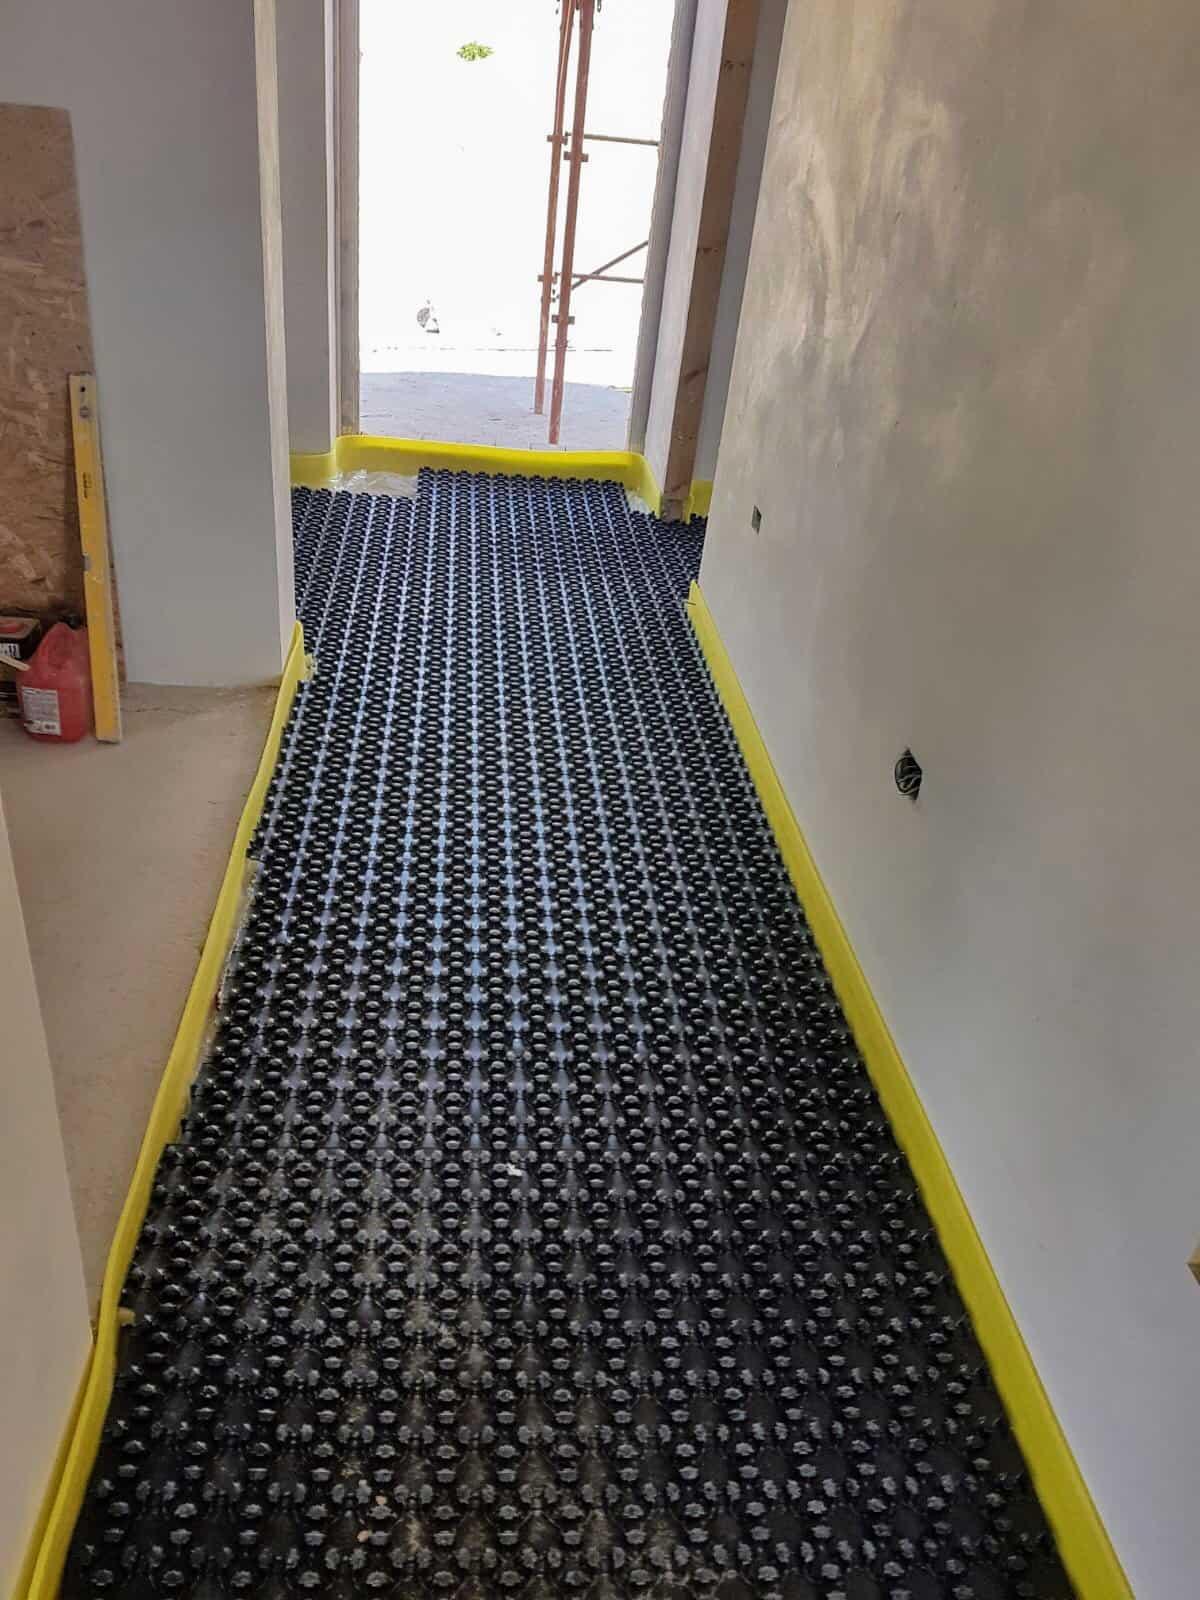 Underfloor Heating Base Layer in Main Hall